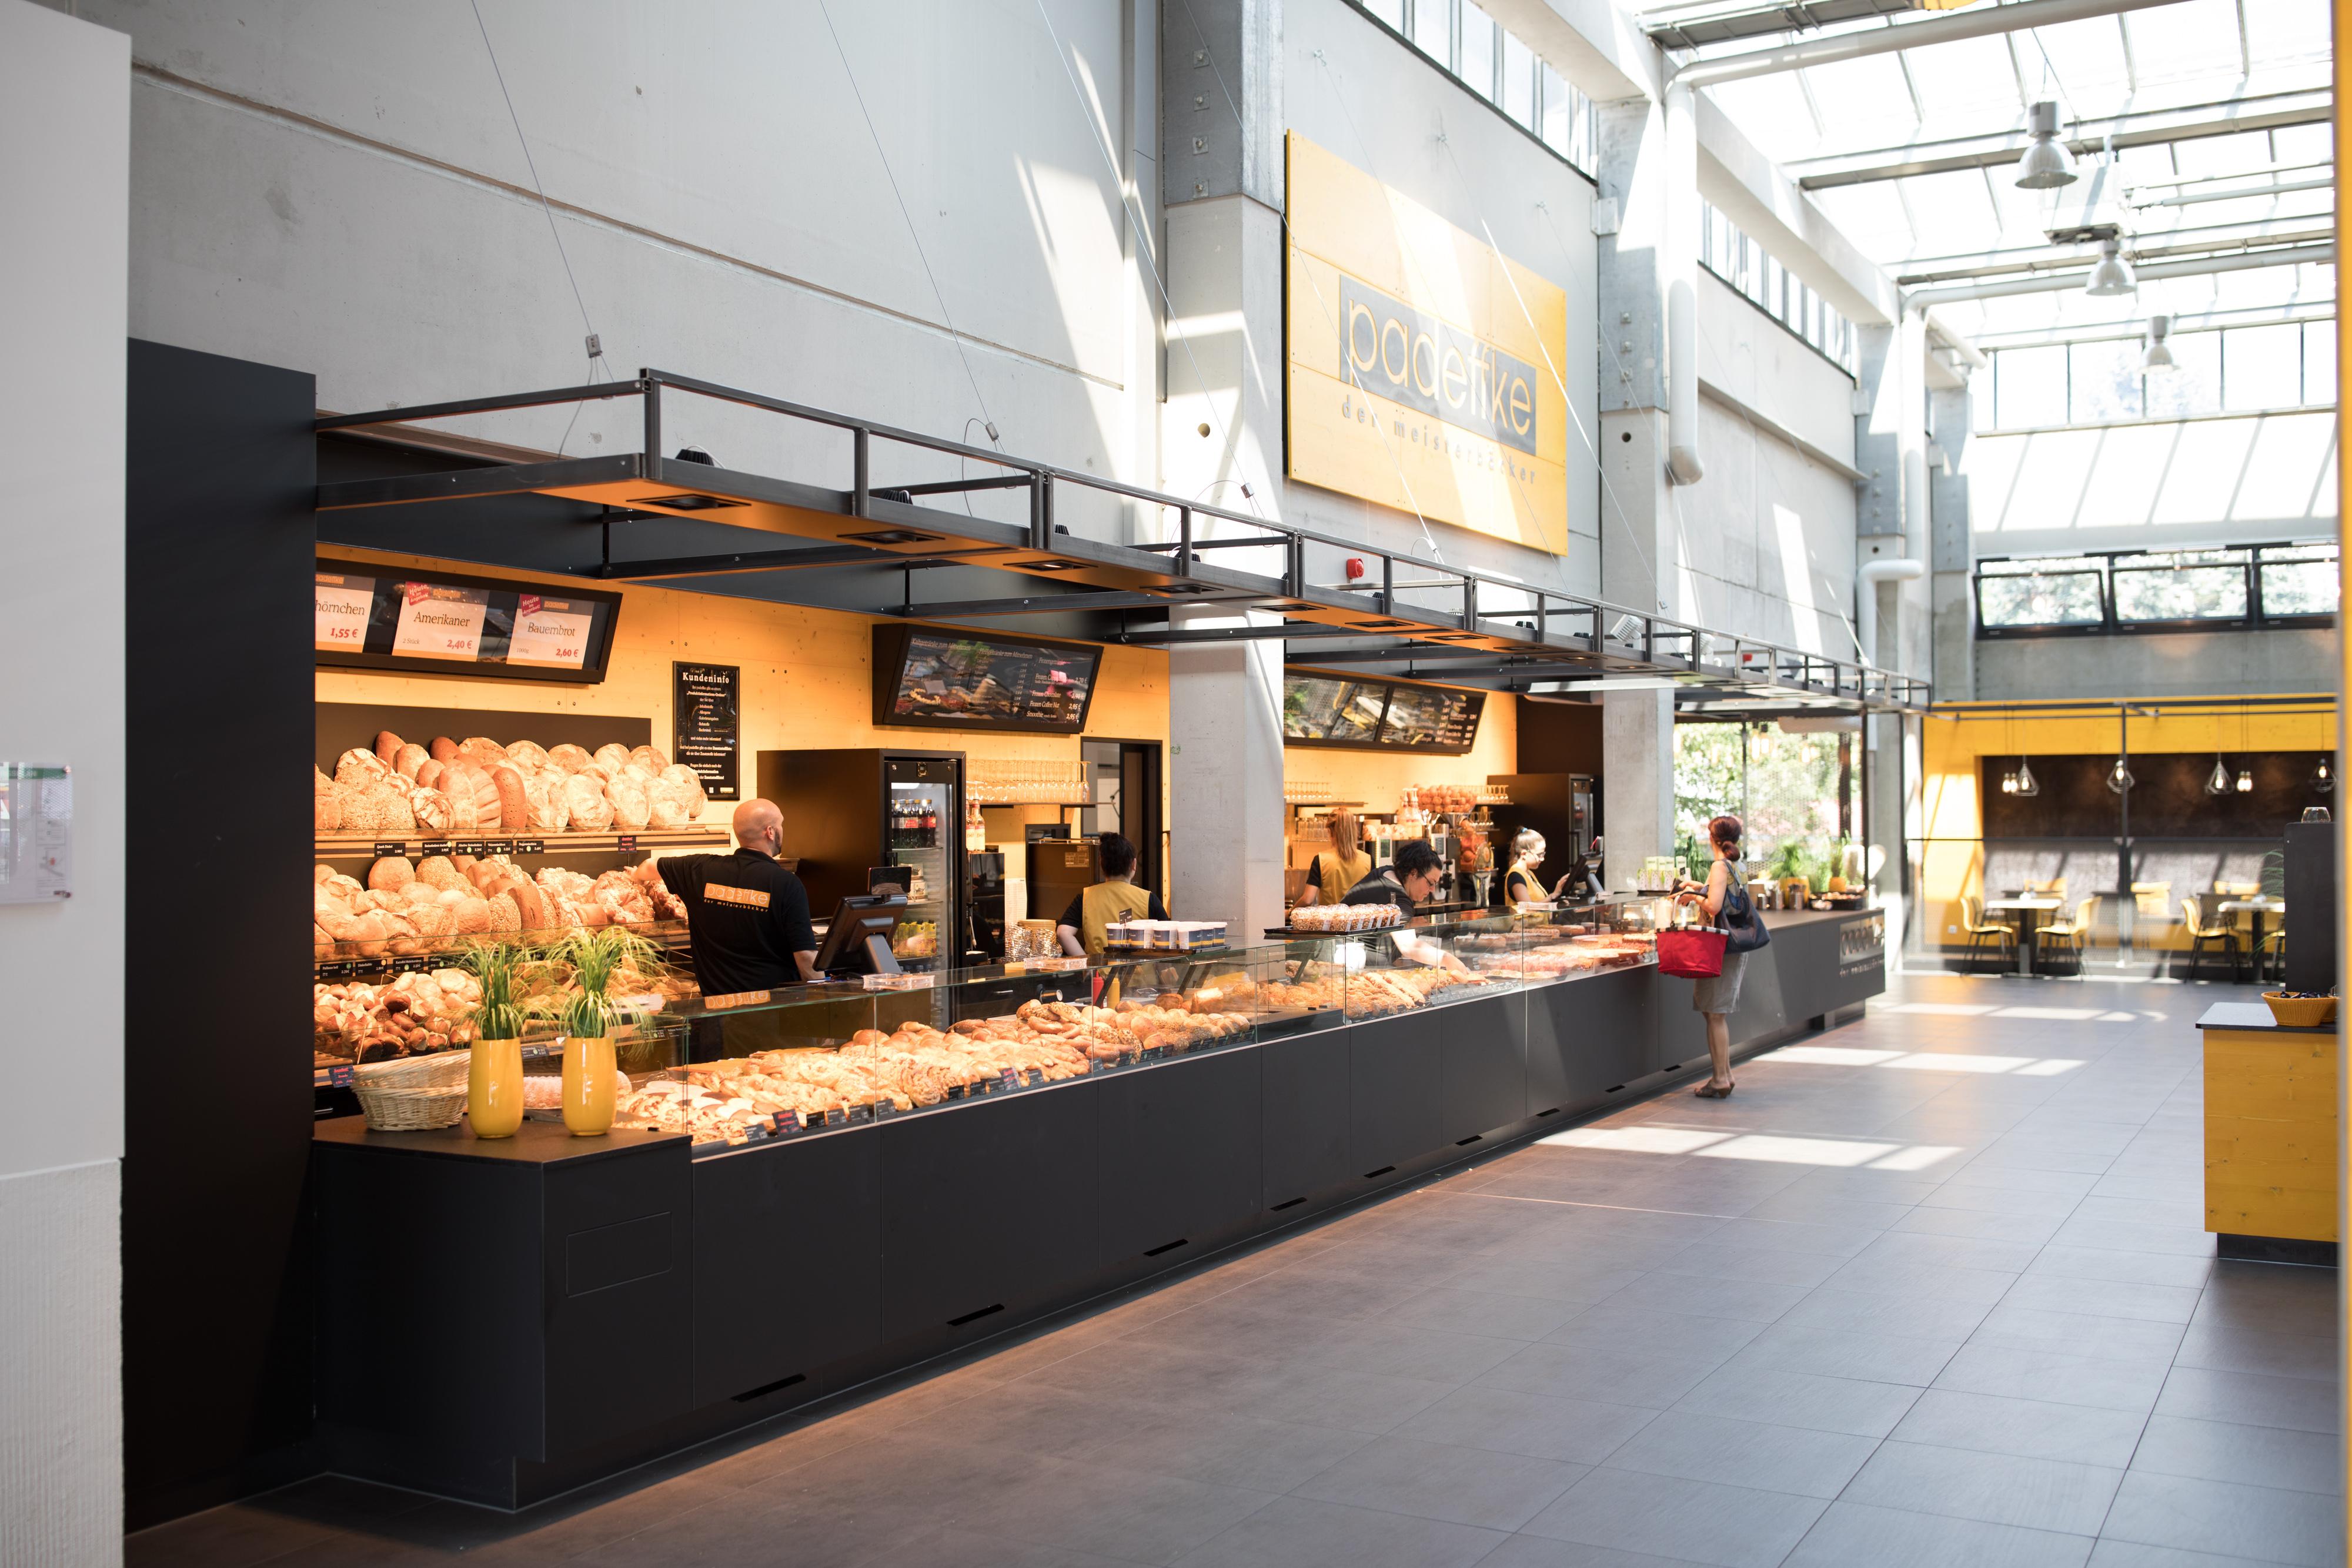 Kaffeehaus Reutlingen, Bäckerei Konditorei Padeffke